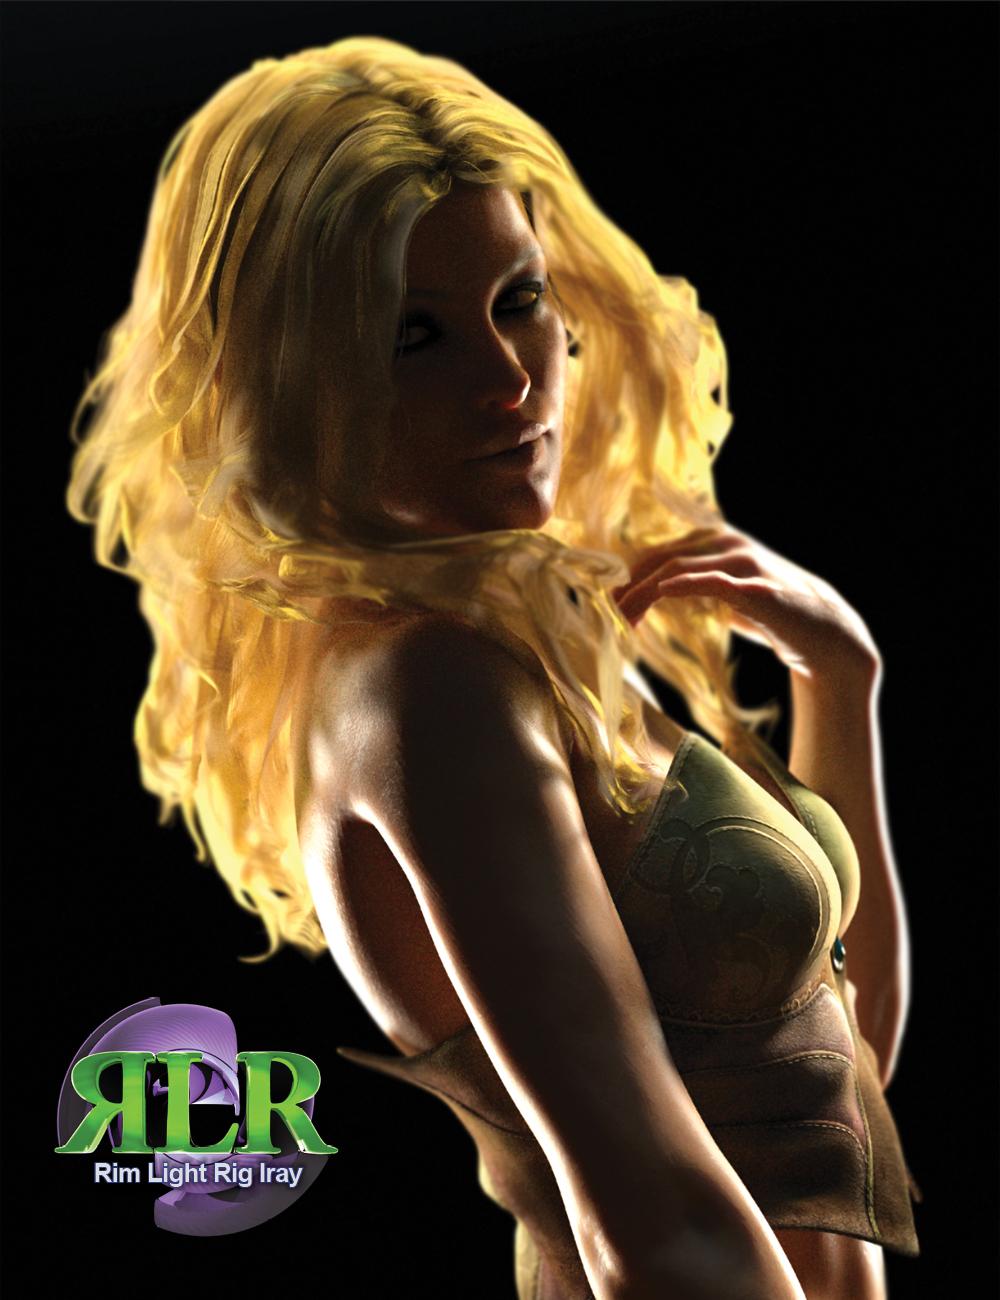 Rim Light Rig Iray by: Marshian, 3D Models by Daz 3D